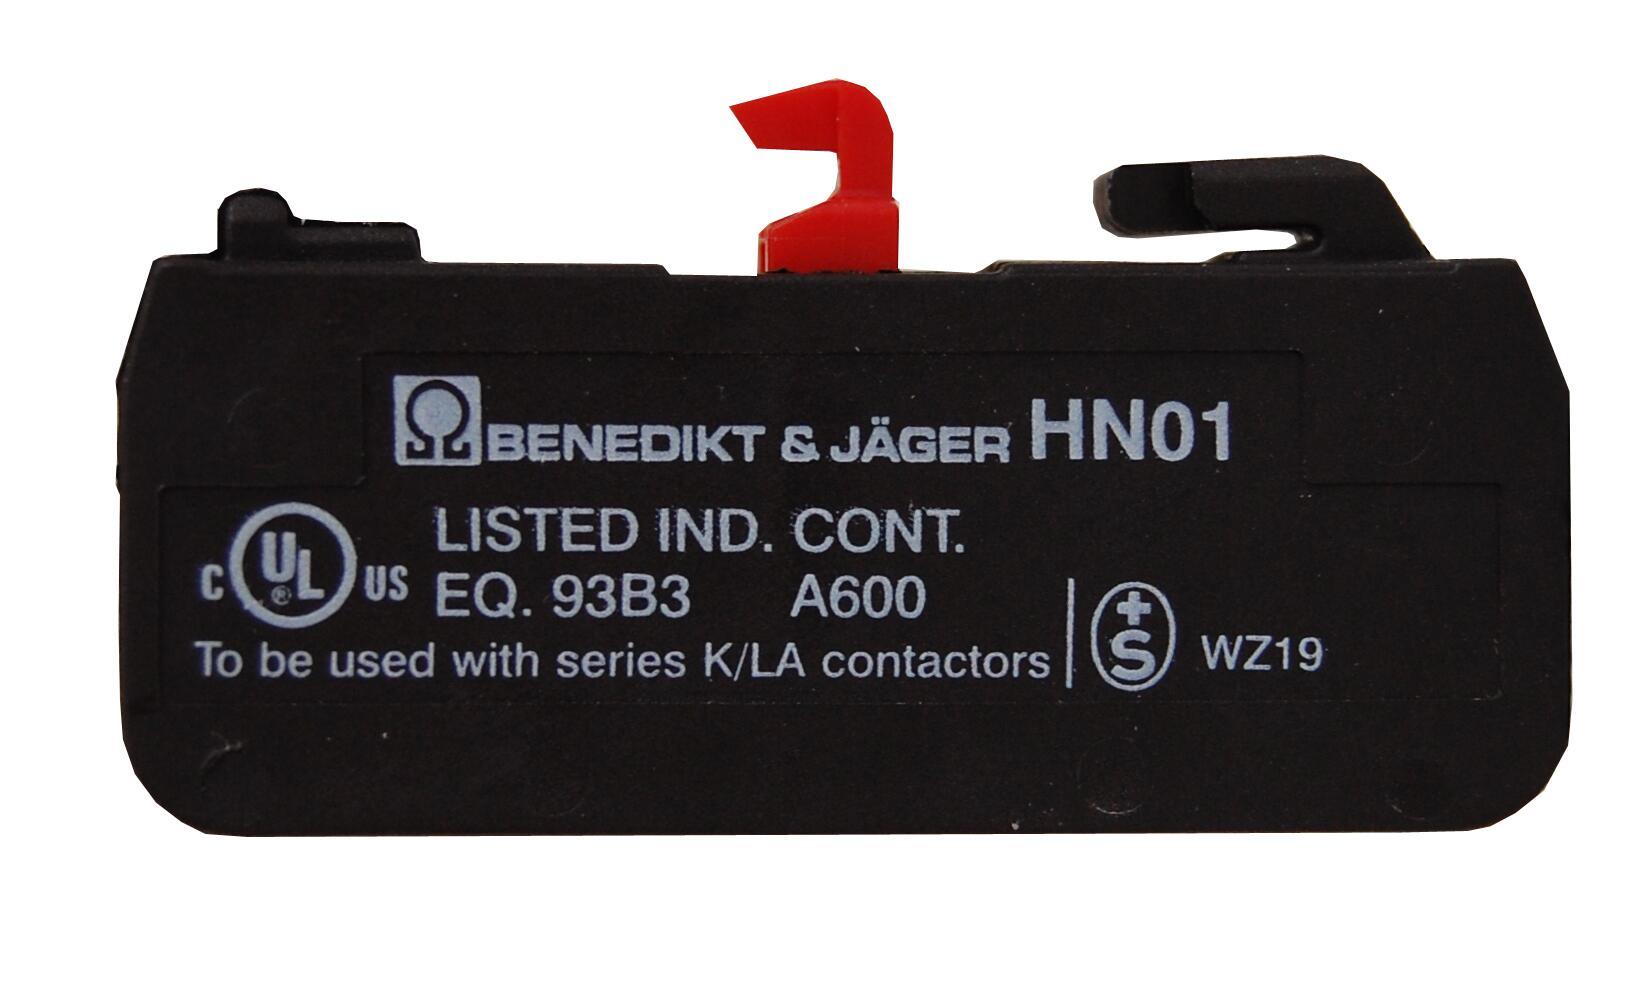 LA190101 - Schrack Technik